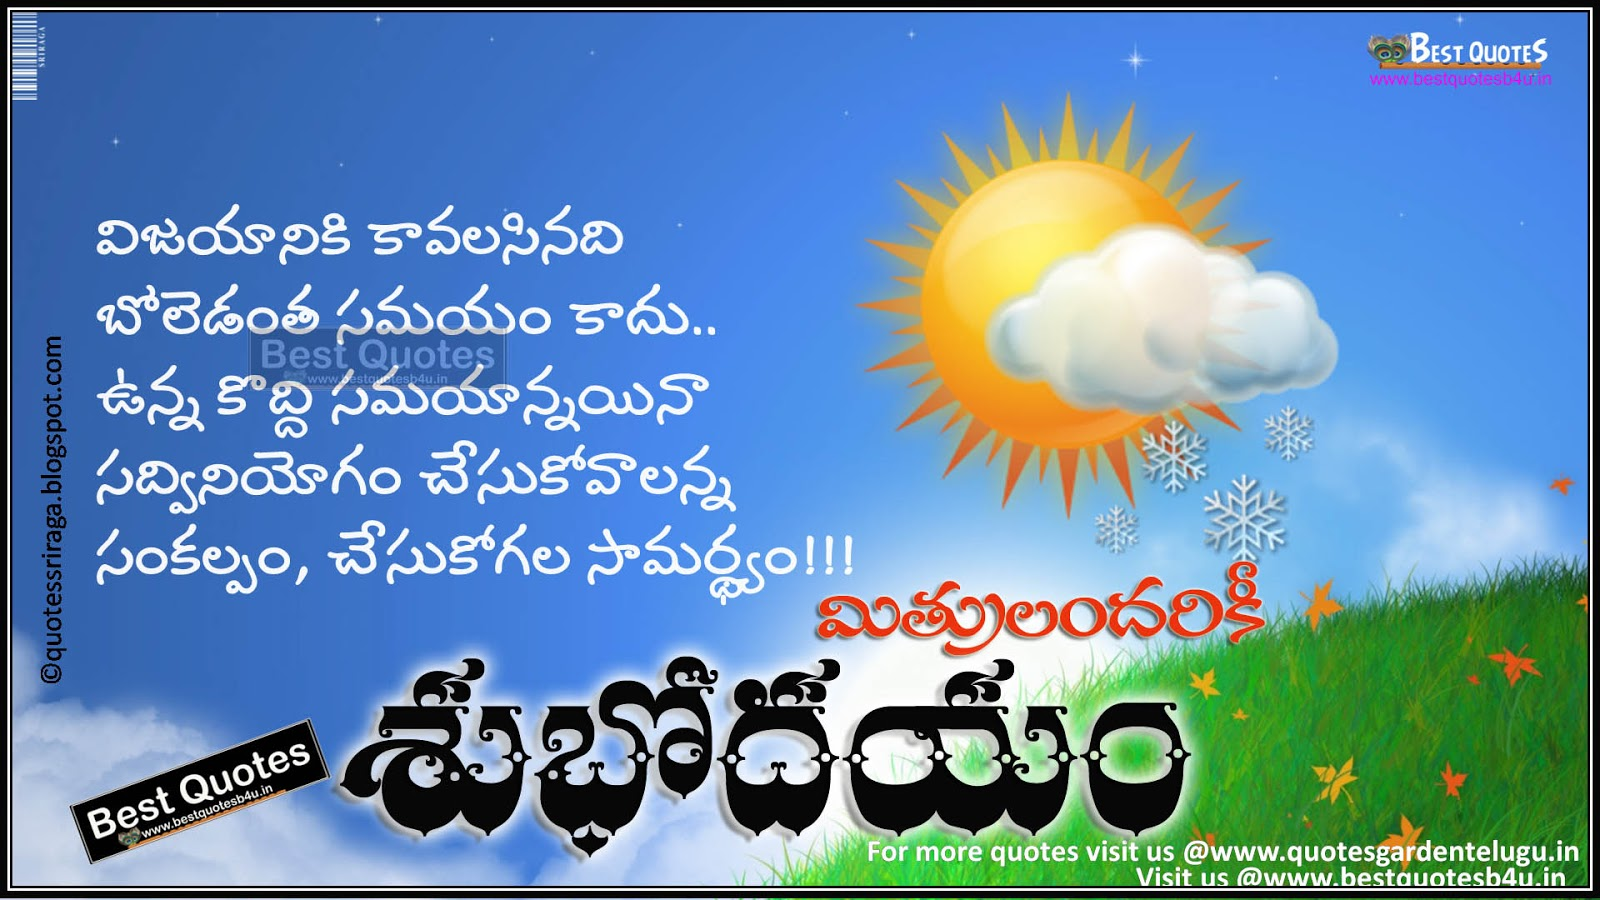 Telugu beautiful lines for good morning greetings like share follow telugu beautiful lines for good morning greetings kristyandbryce Gallery